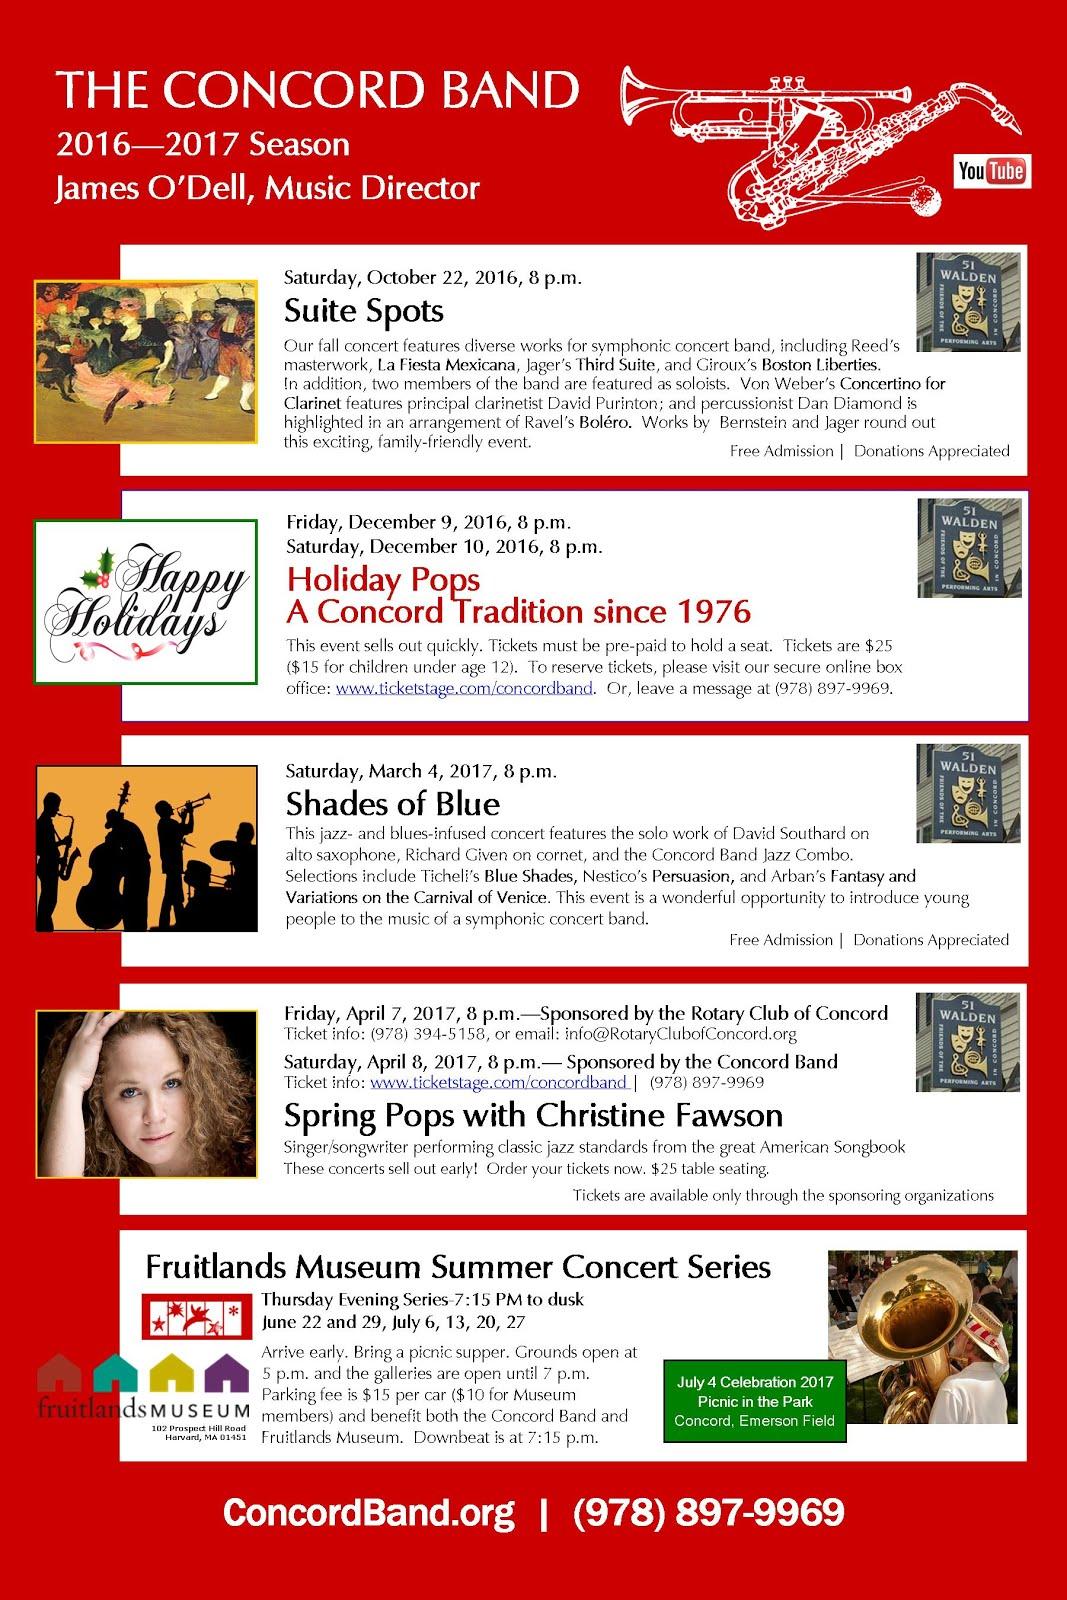 Concord Band 2016–17 Season